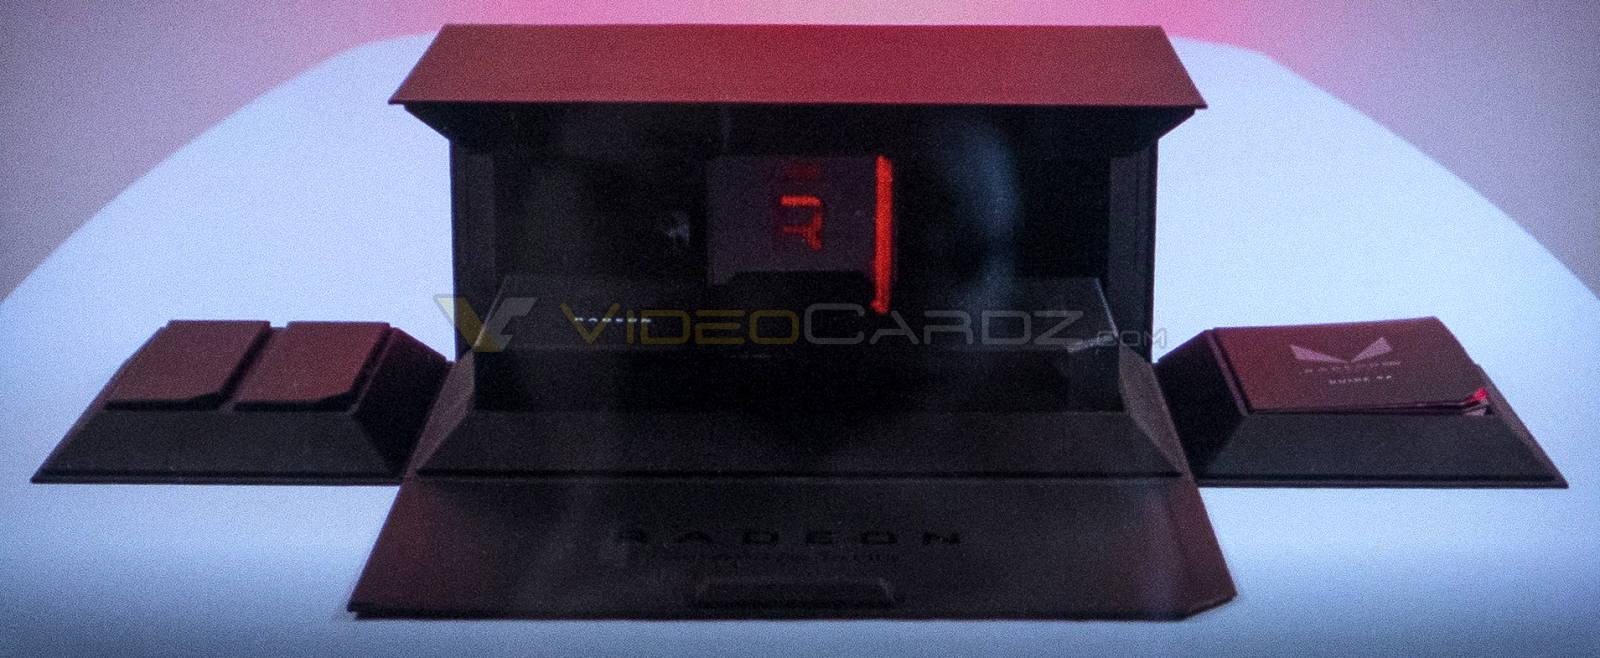 More RX Vega promotional images appear